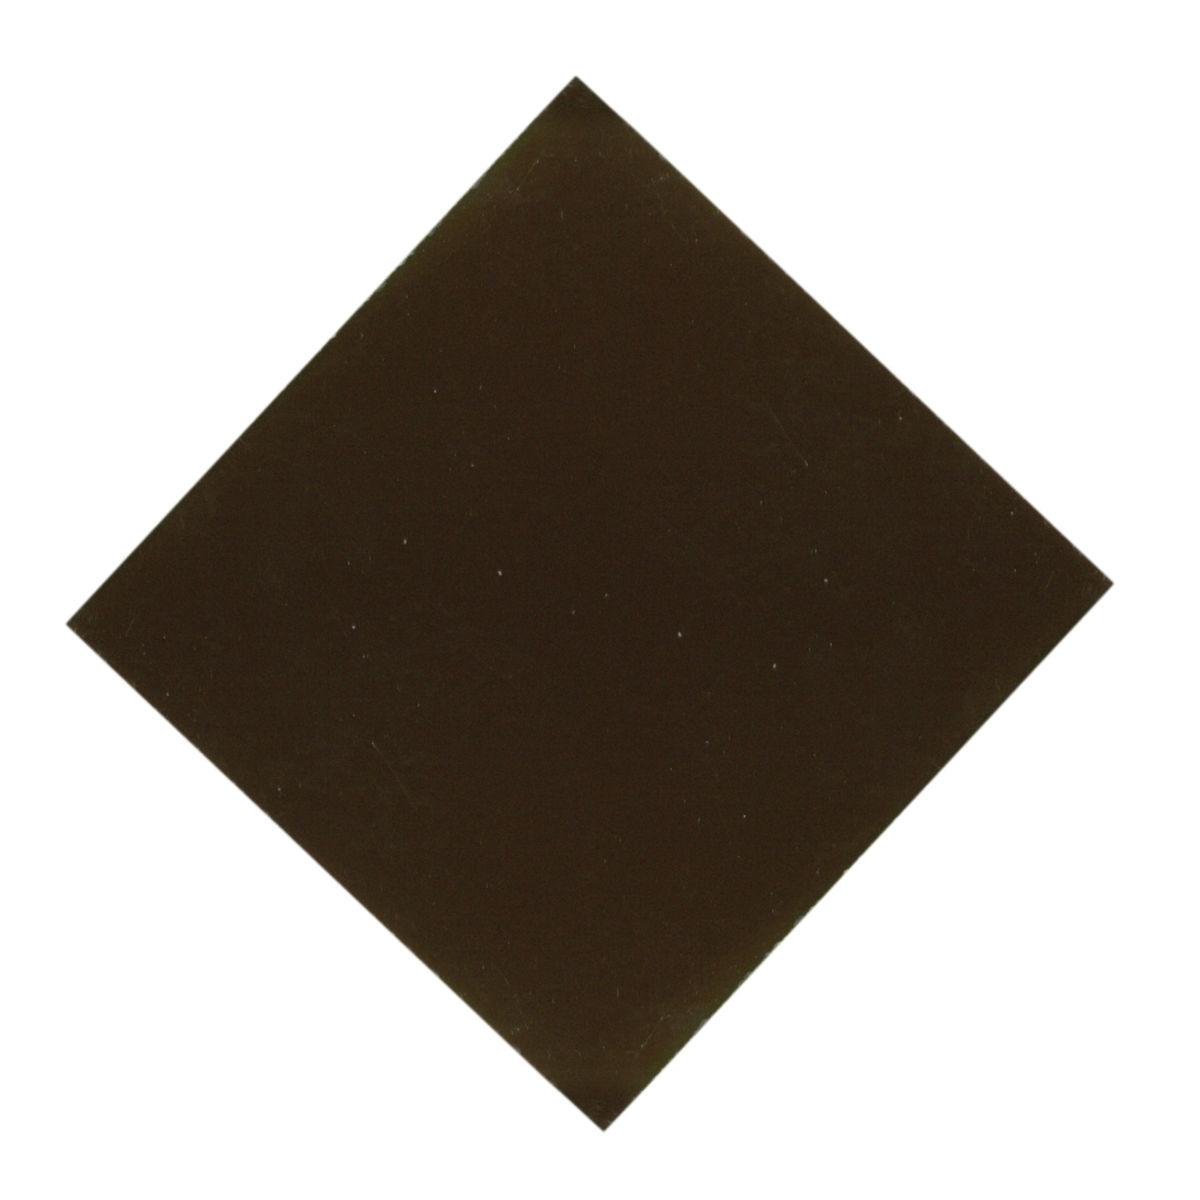 Lastra vetro sintetico fum 2000 x 1000 mm spessore 2 5 for Vetro sintetico leroy merlin